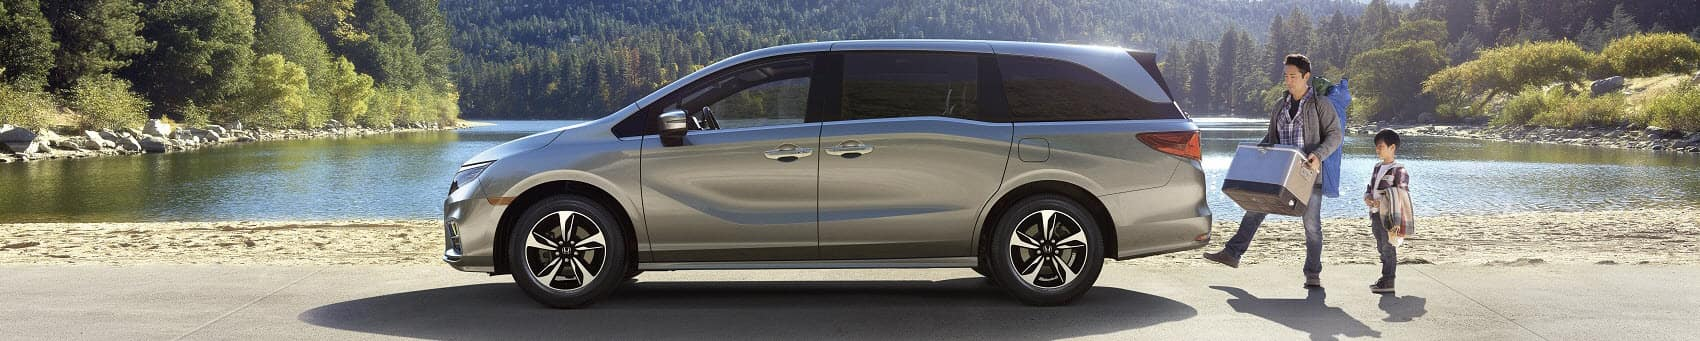 Family with Honda Odyssey